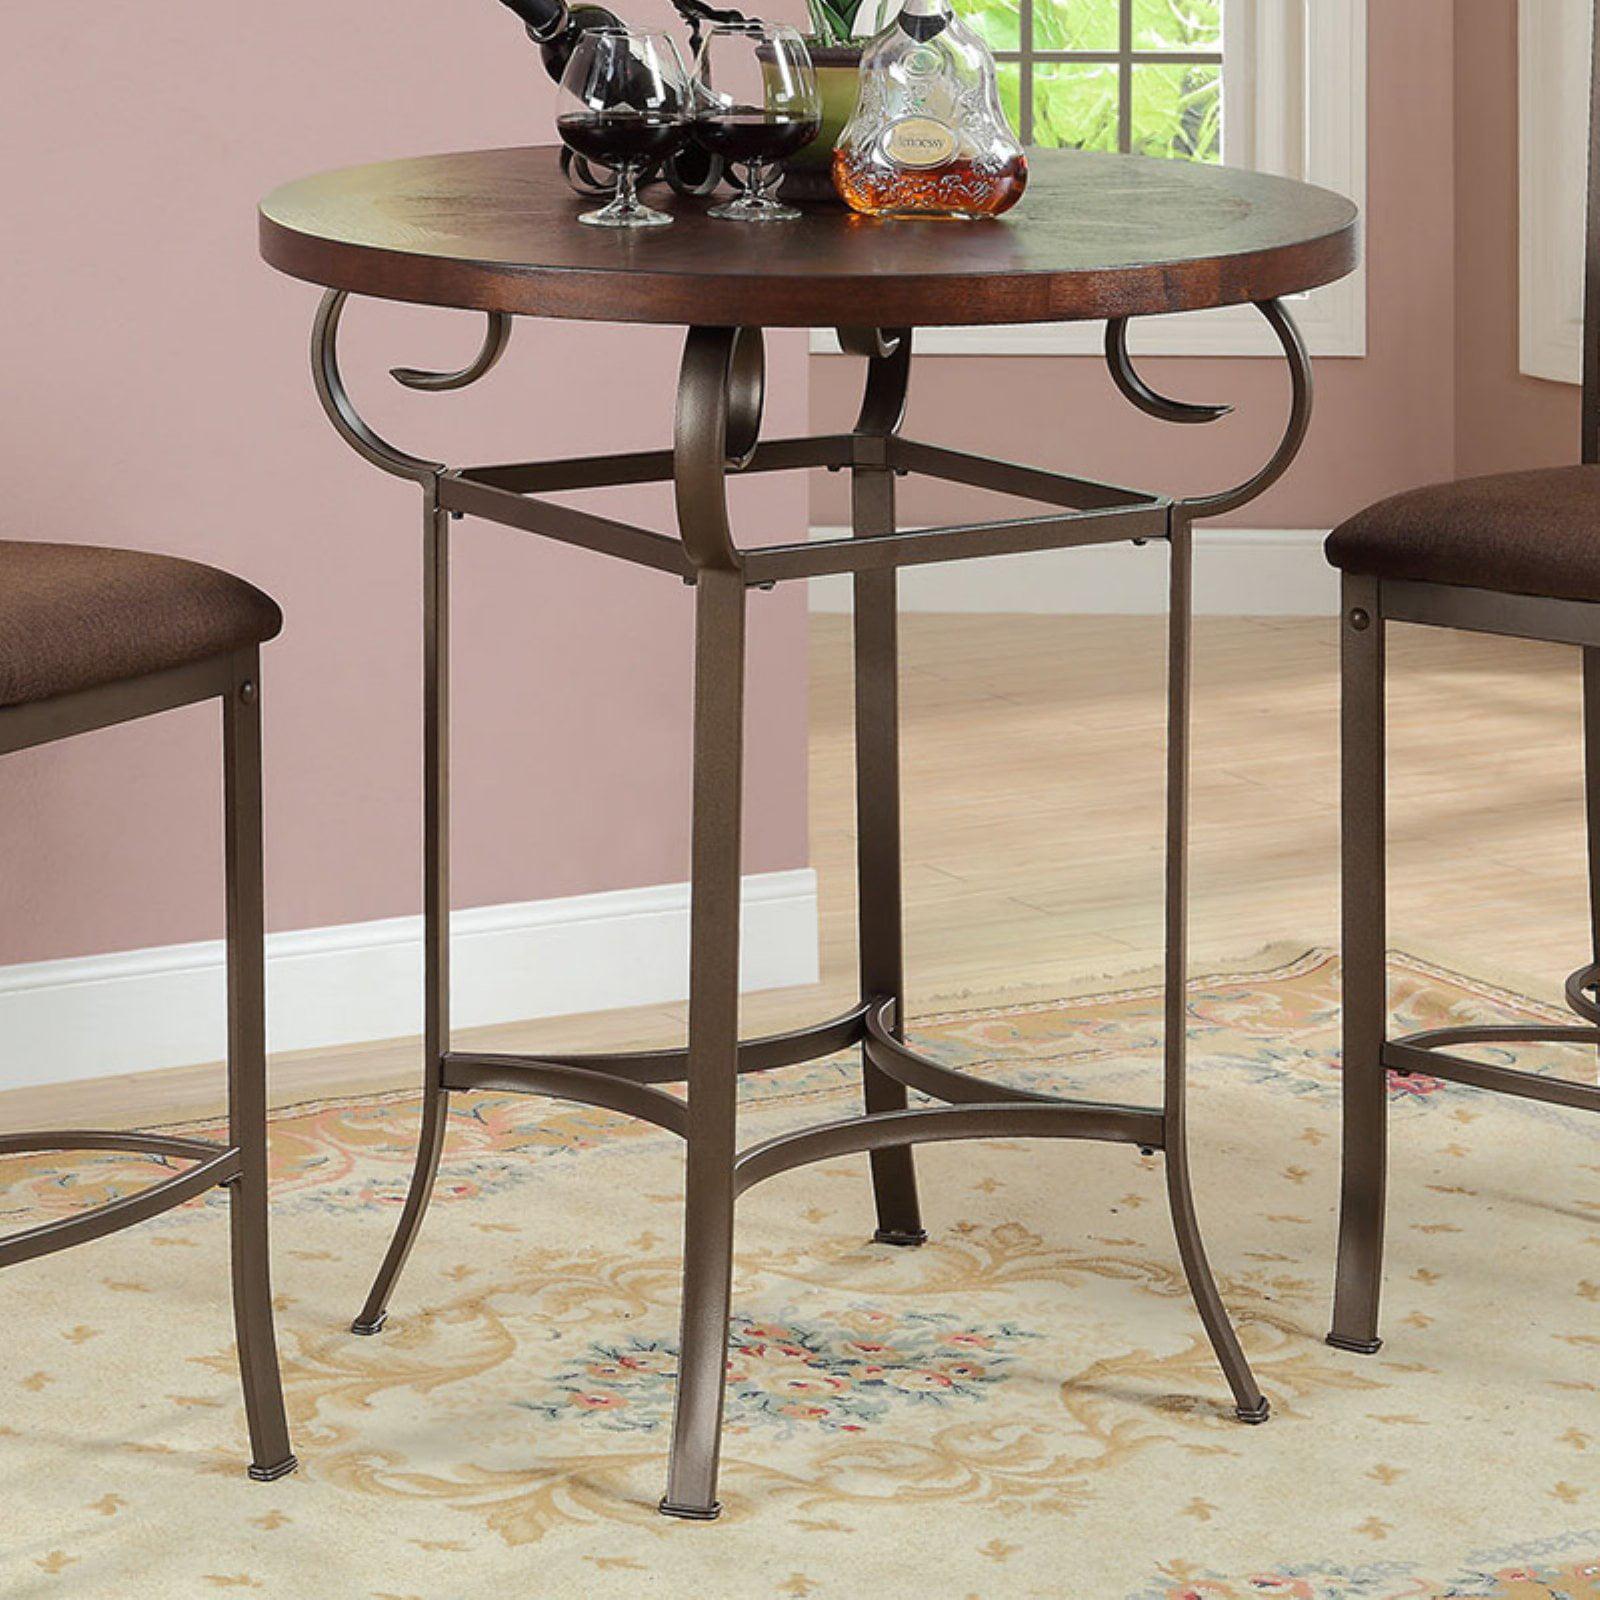 Acme Furniture Tavio Bar Height Pub Table Dark Bronze by Acme